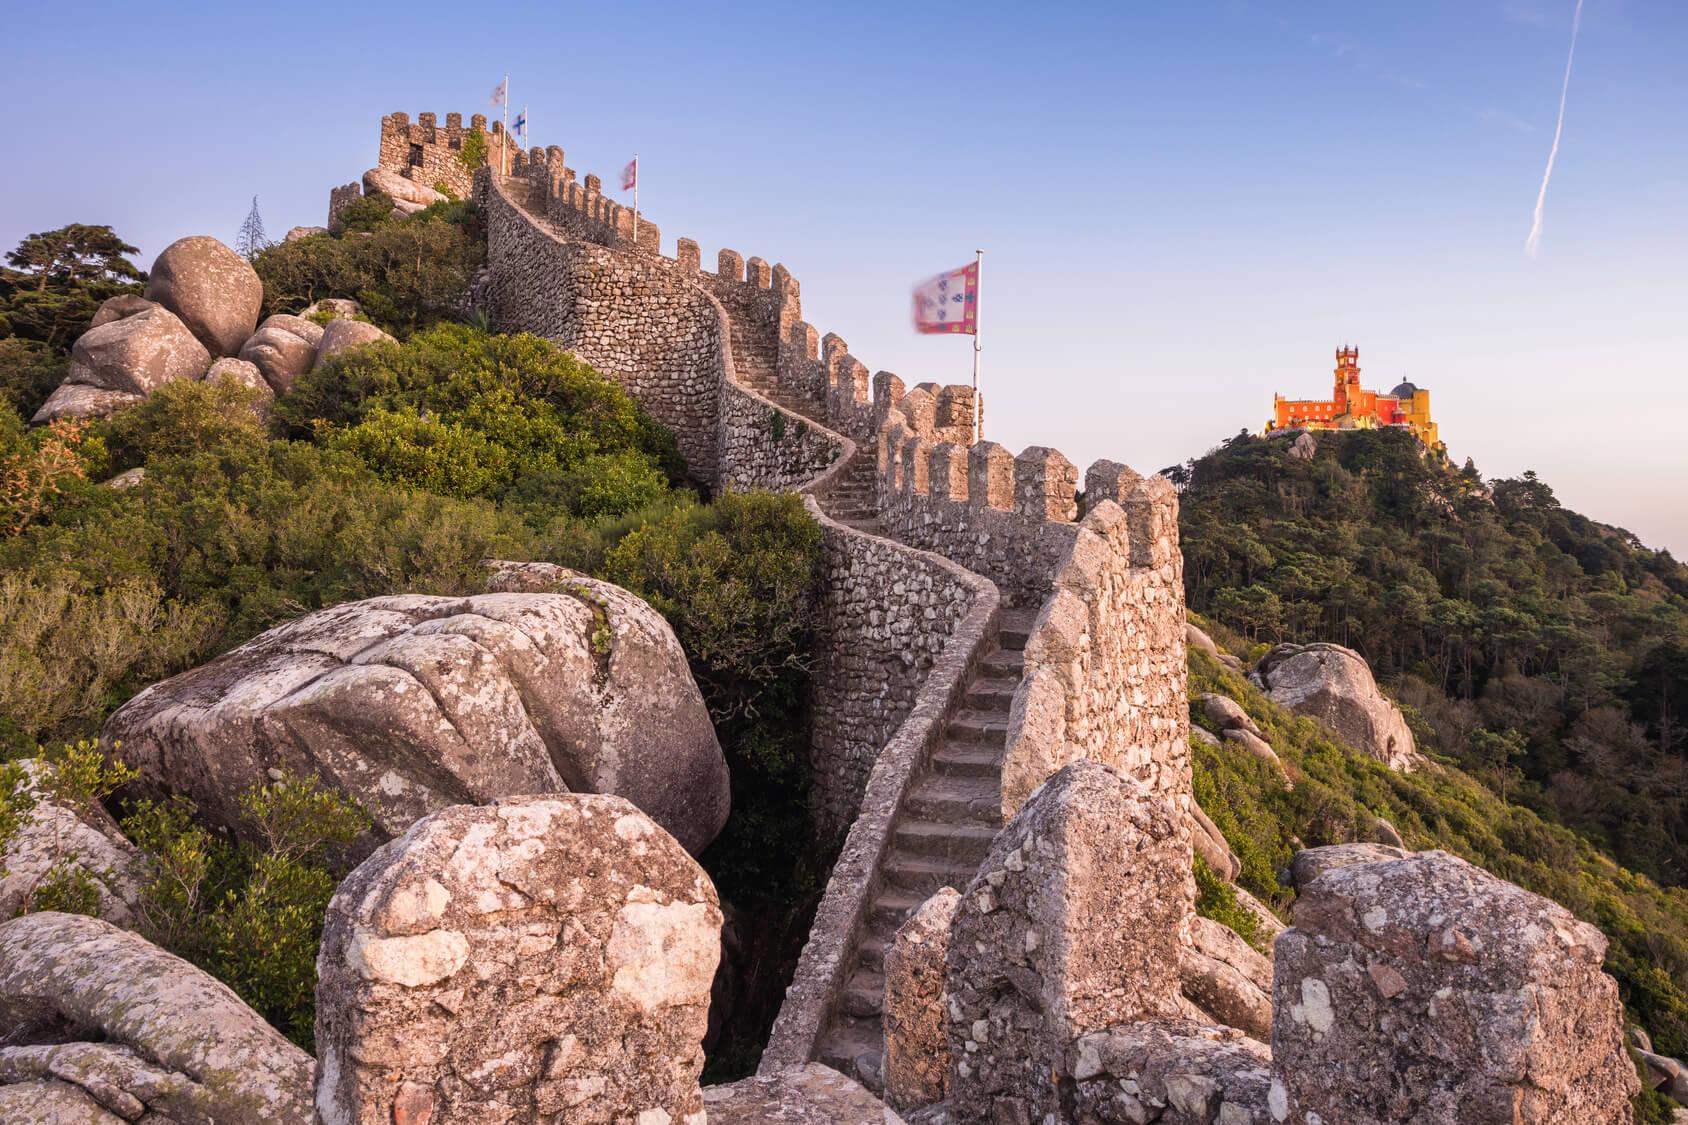 Image of Sintra Castle